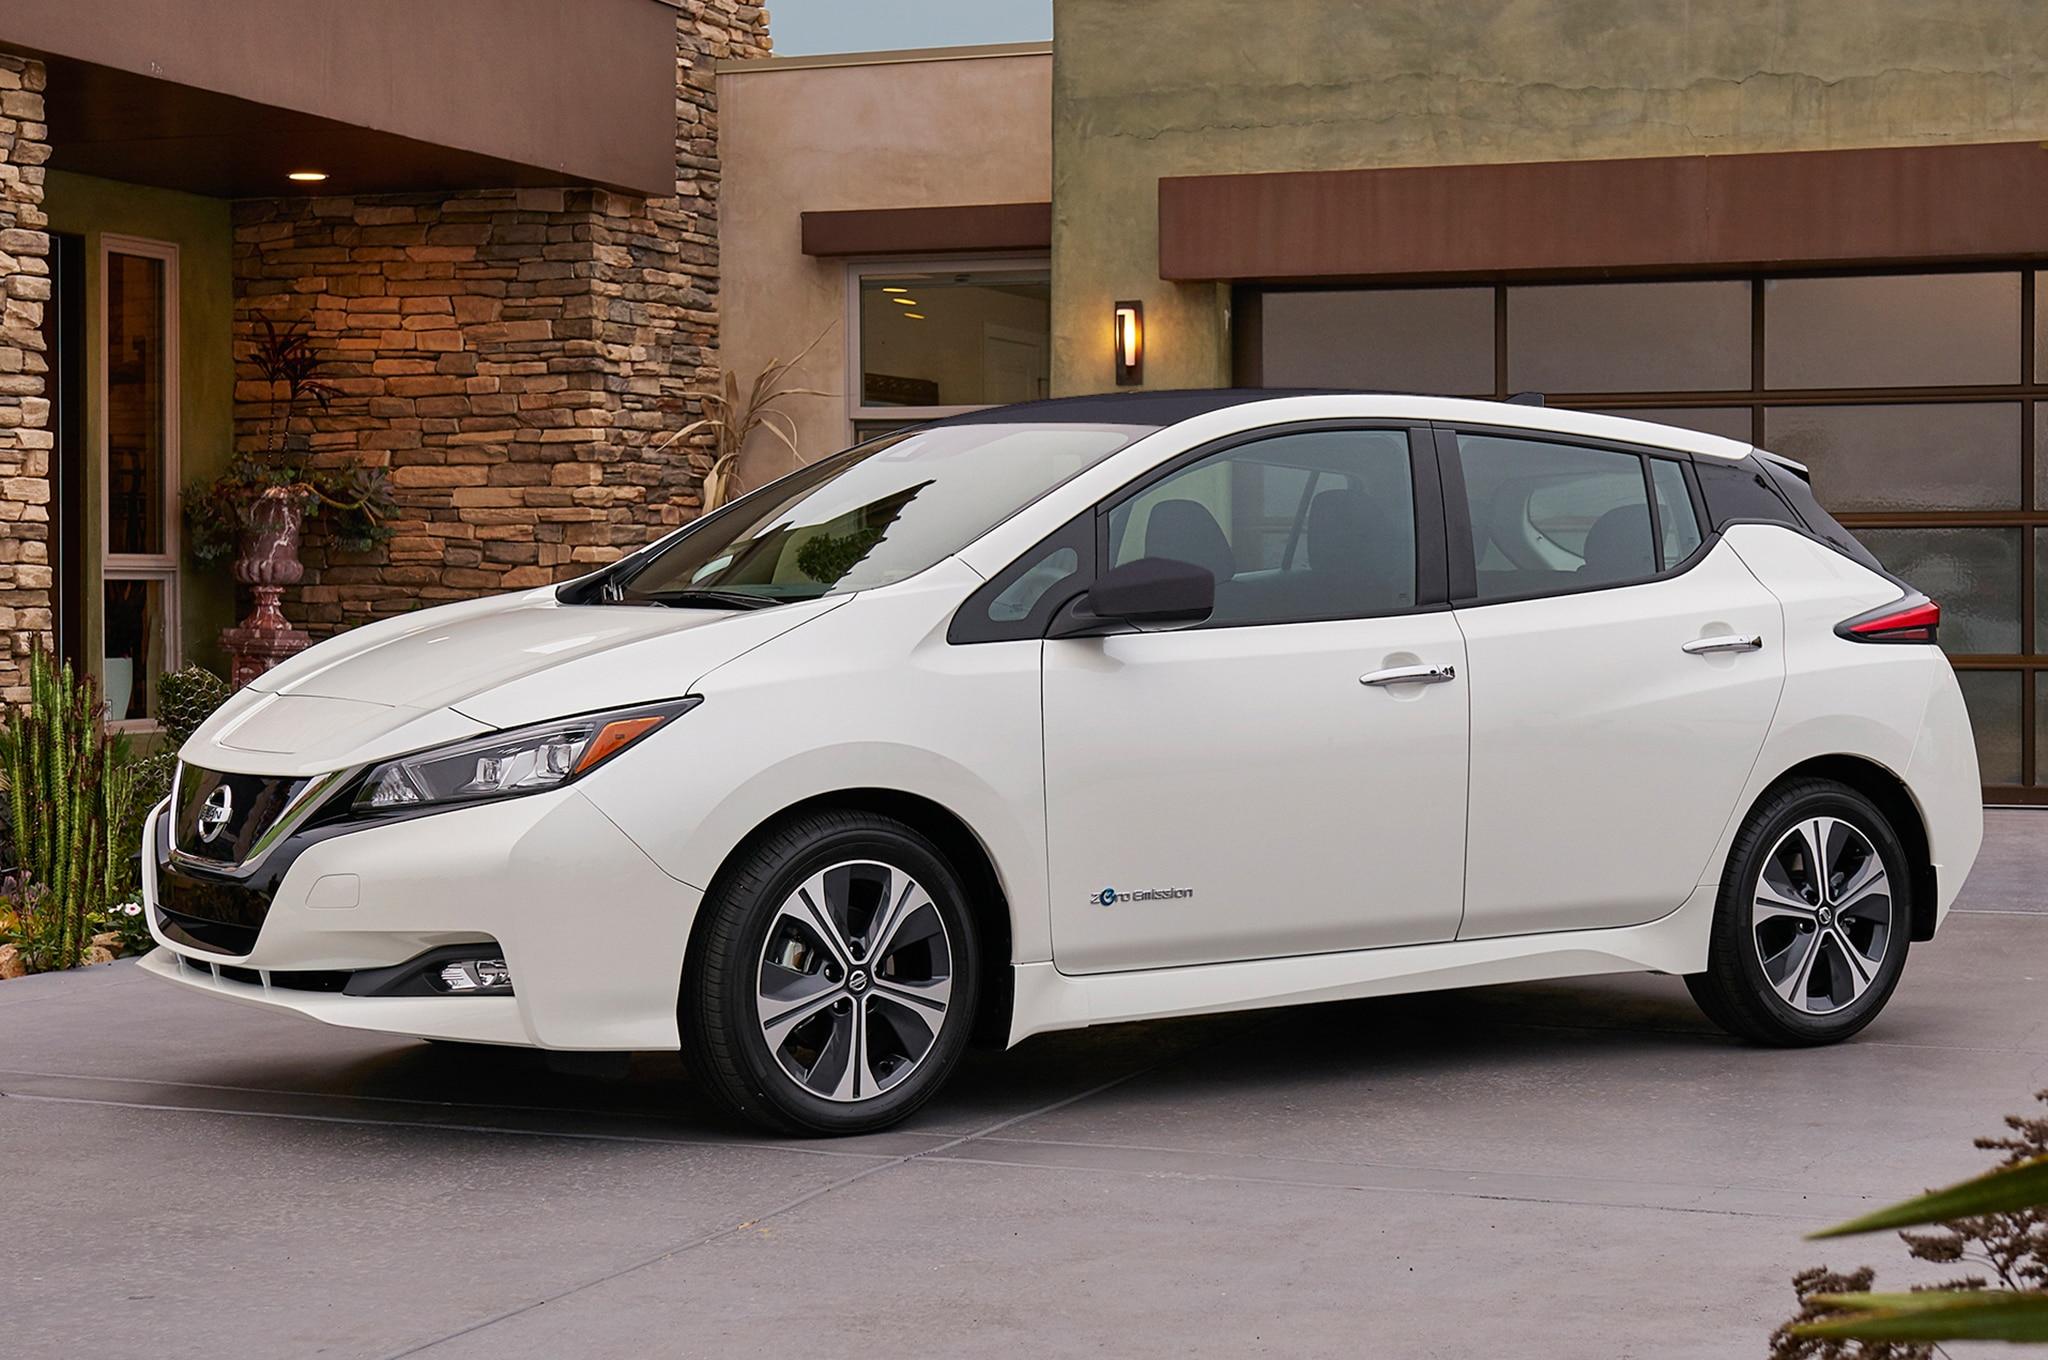 2018 Nissan Leaf Front Three Quarter 00